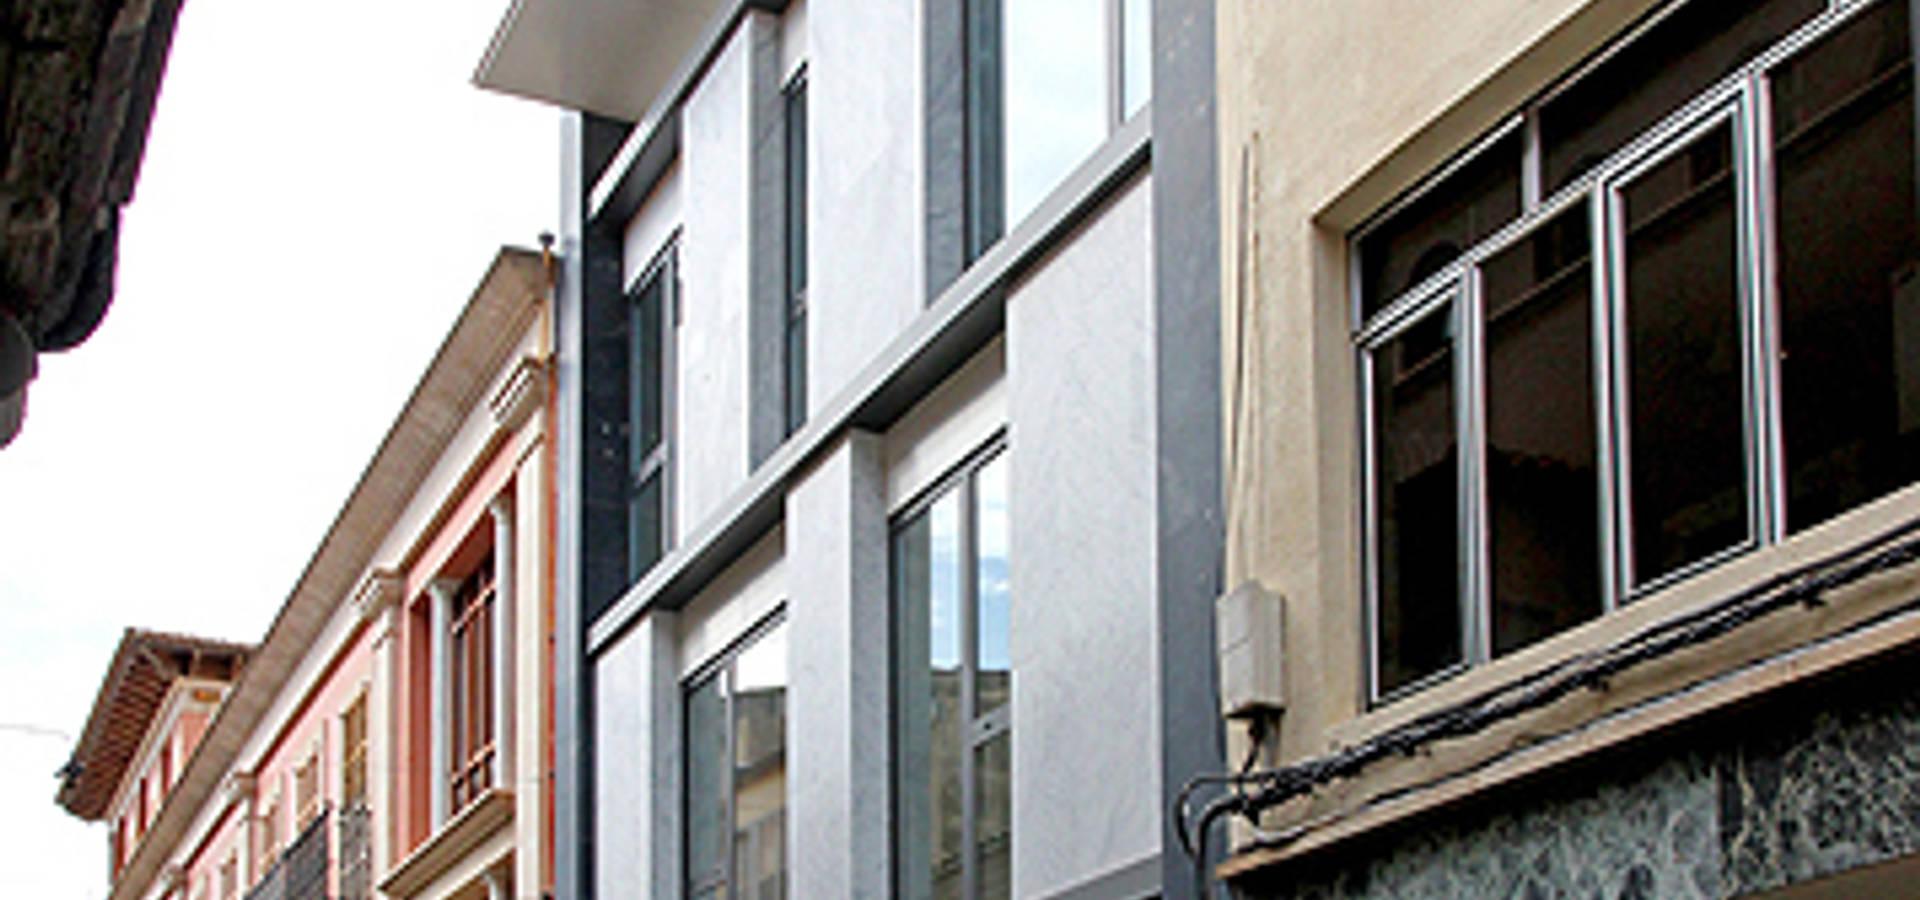 Galmés + Mansergas Arquitectes